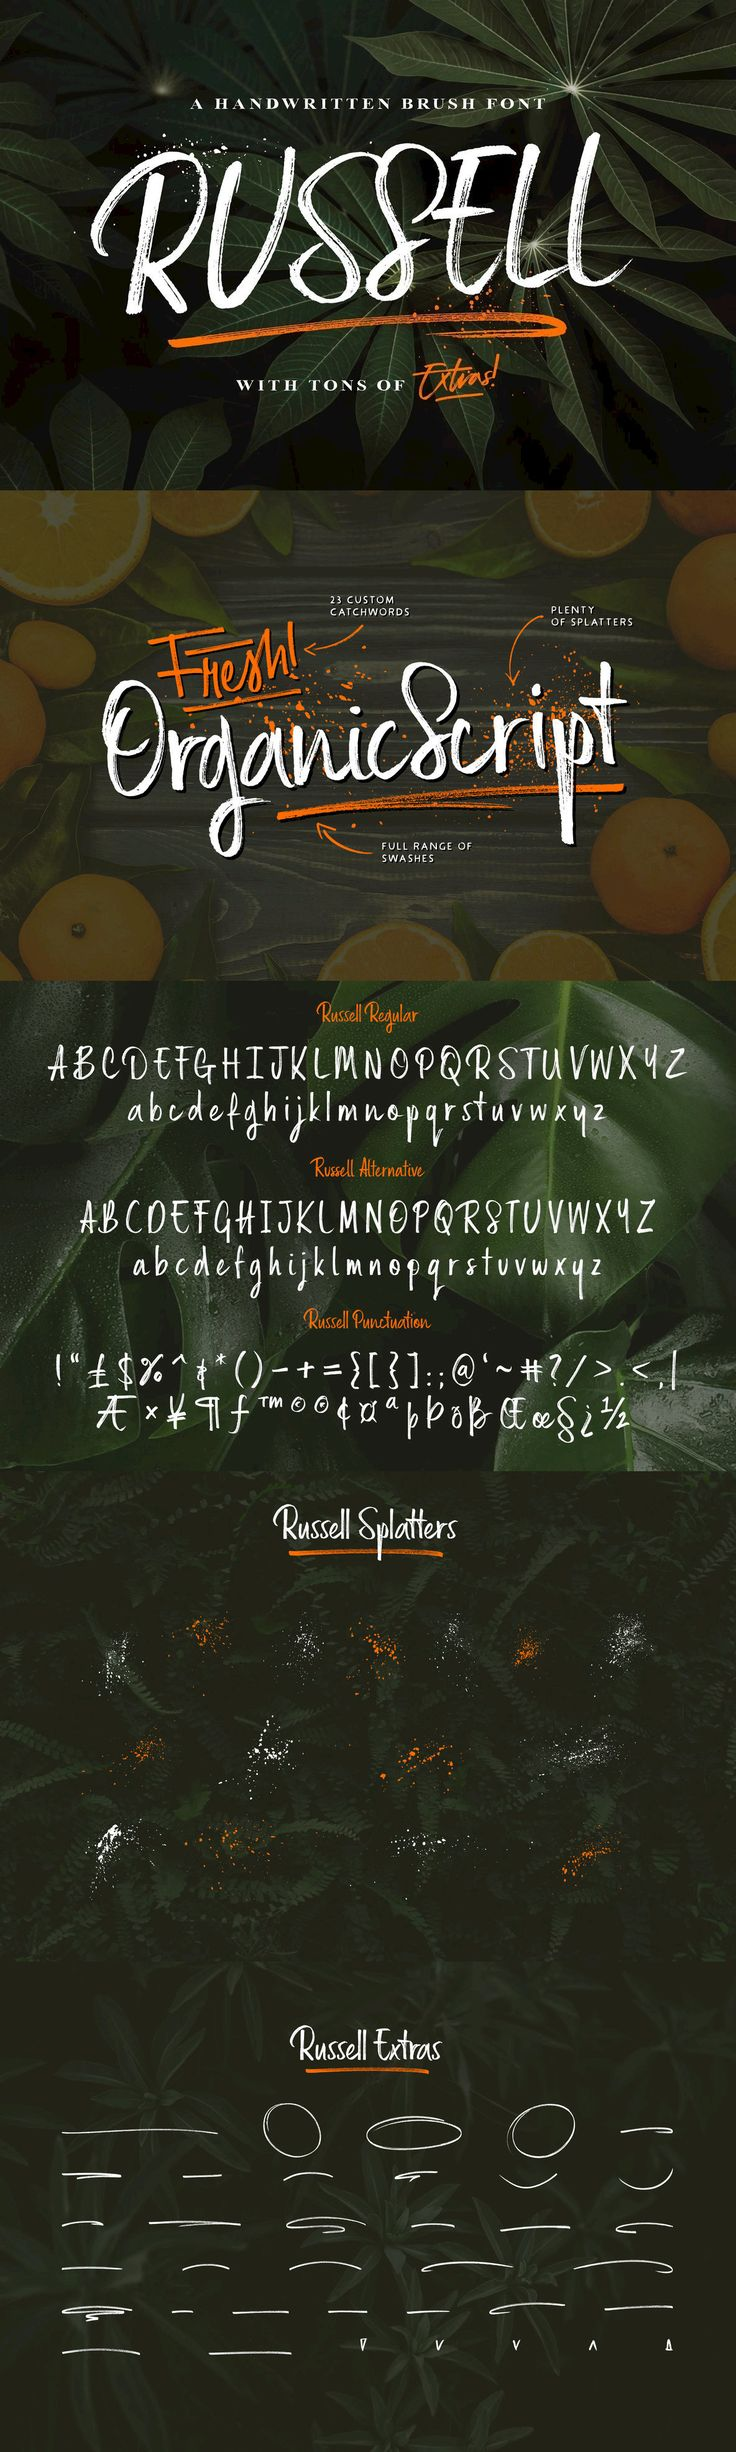 best fonts u stuff images on pinterest graph design